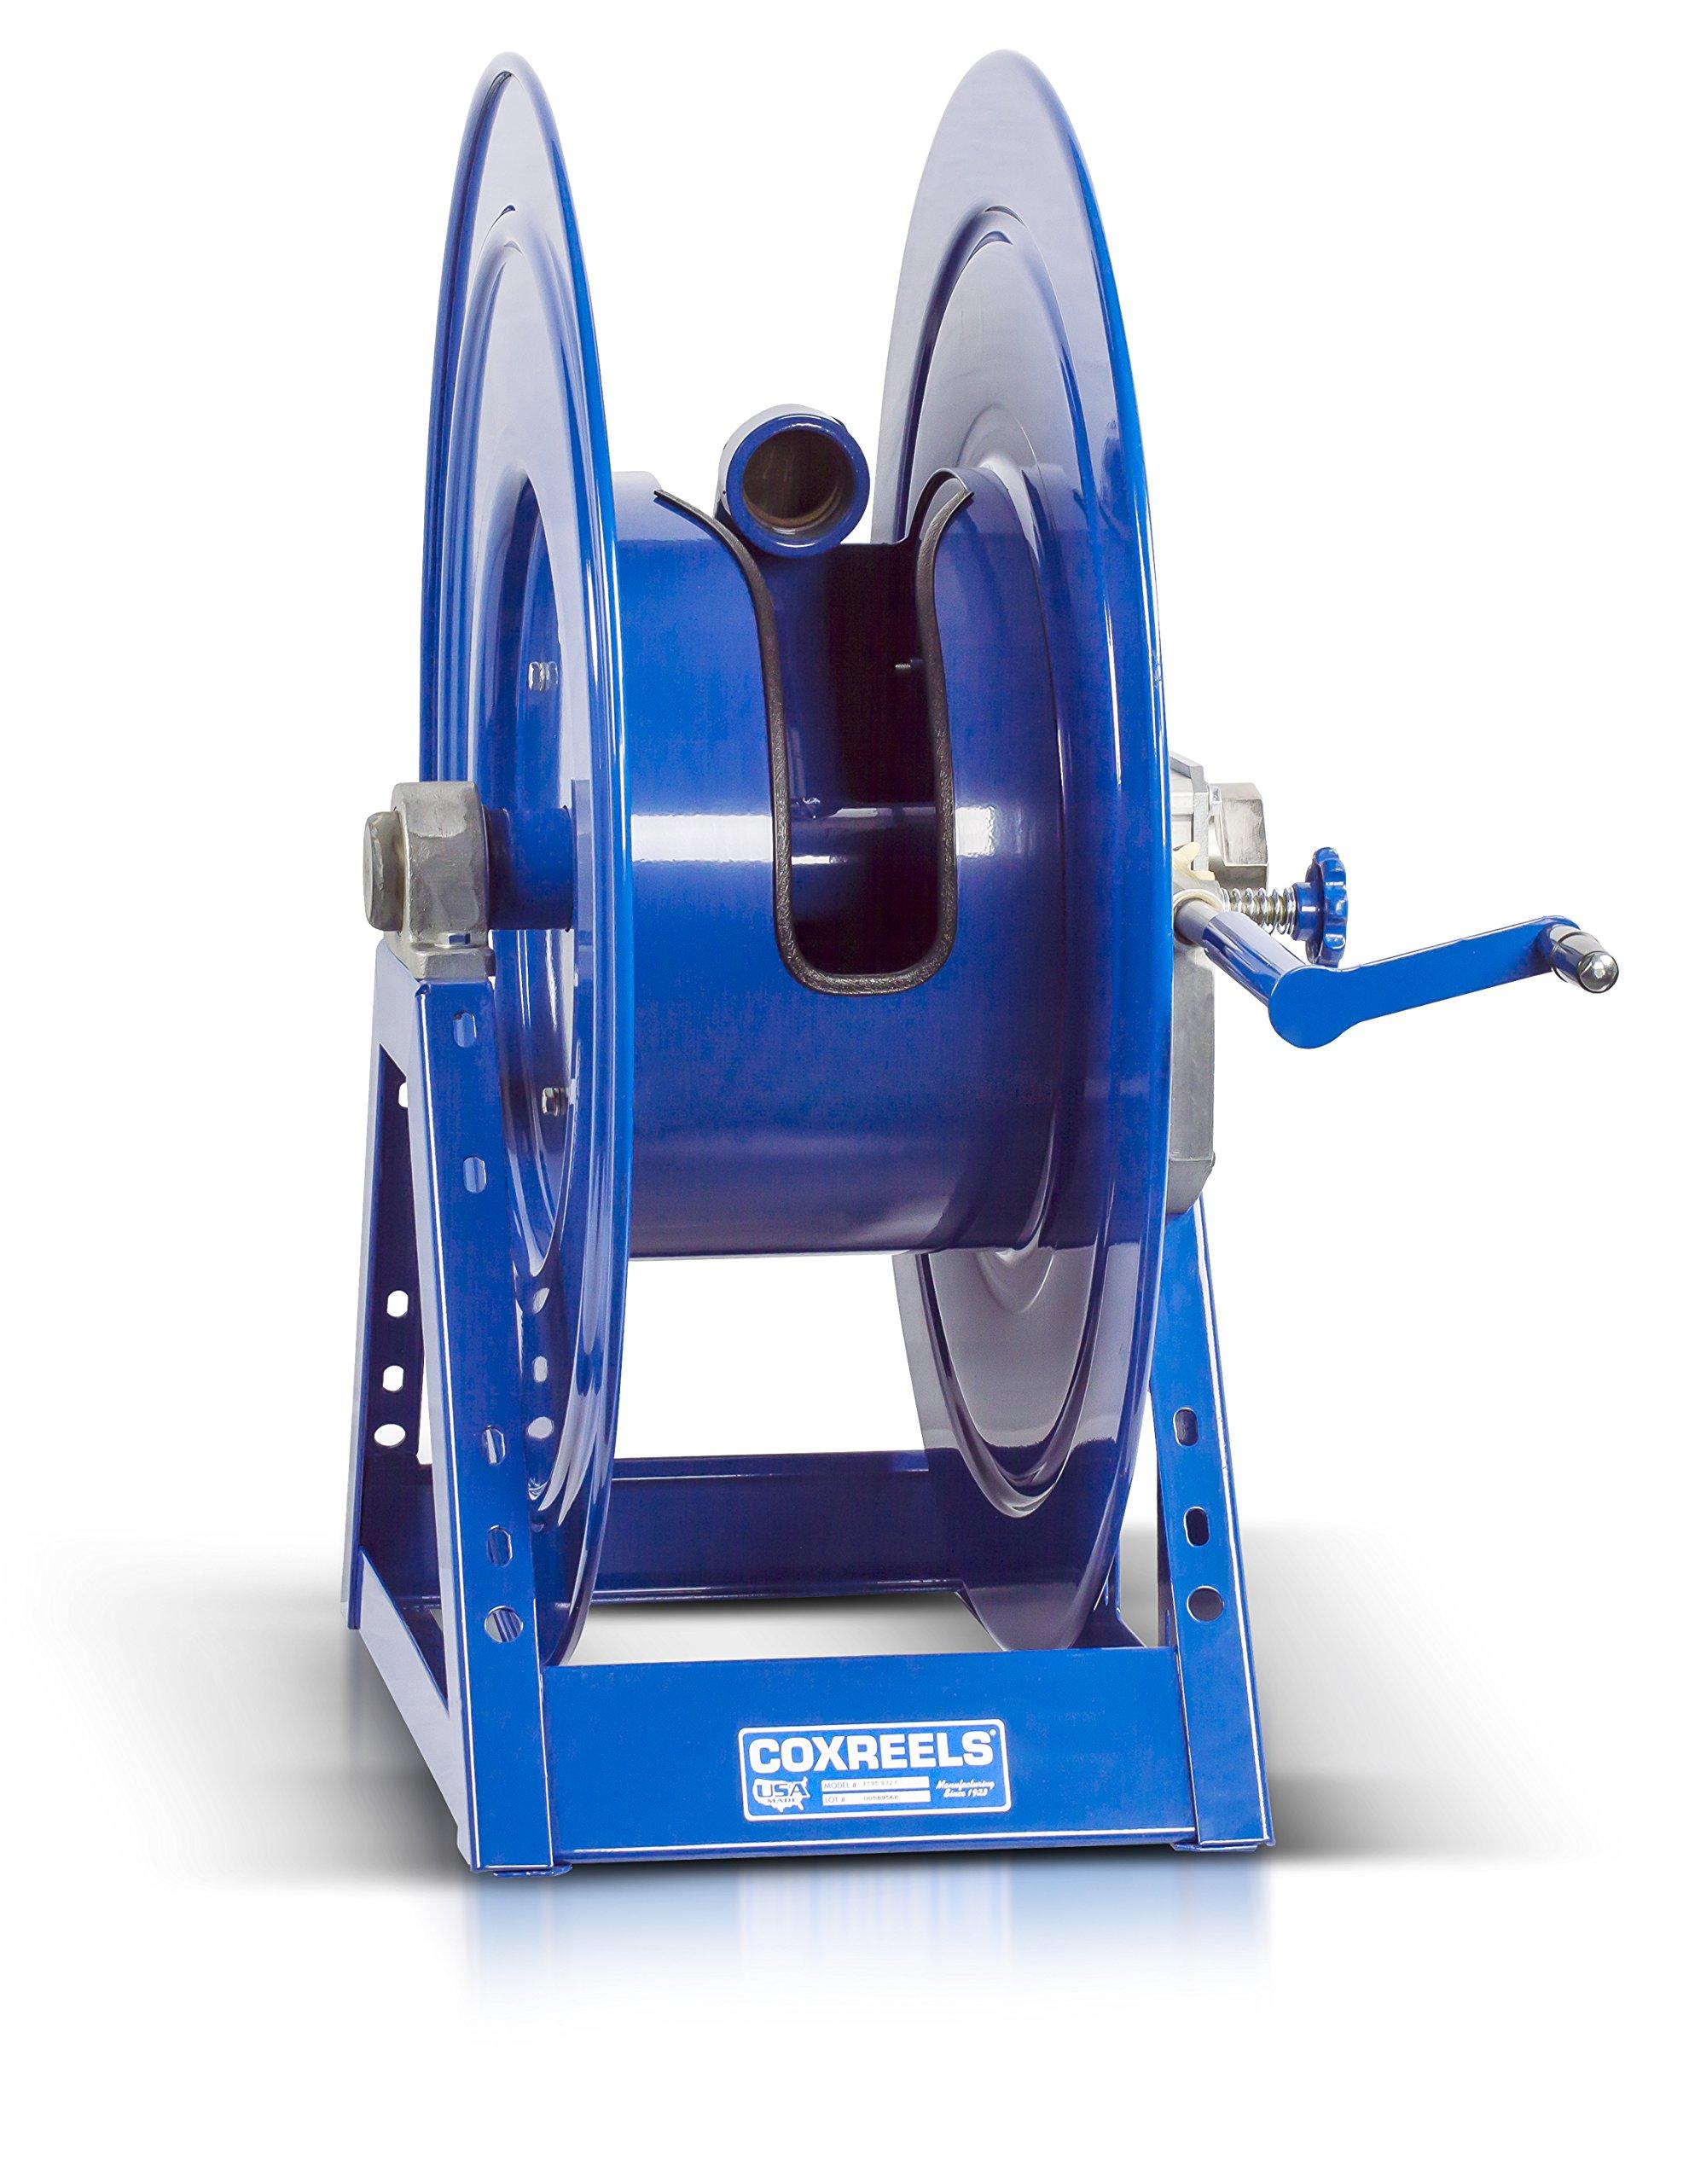 Coxreels 1195-1332-C Beveled Gear Hand Crank Hose Reel: 2'' I.D., 75' hose capacity, less hose, 600 PSI